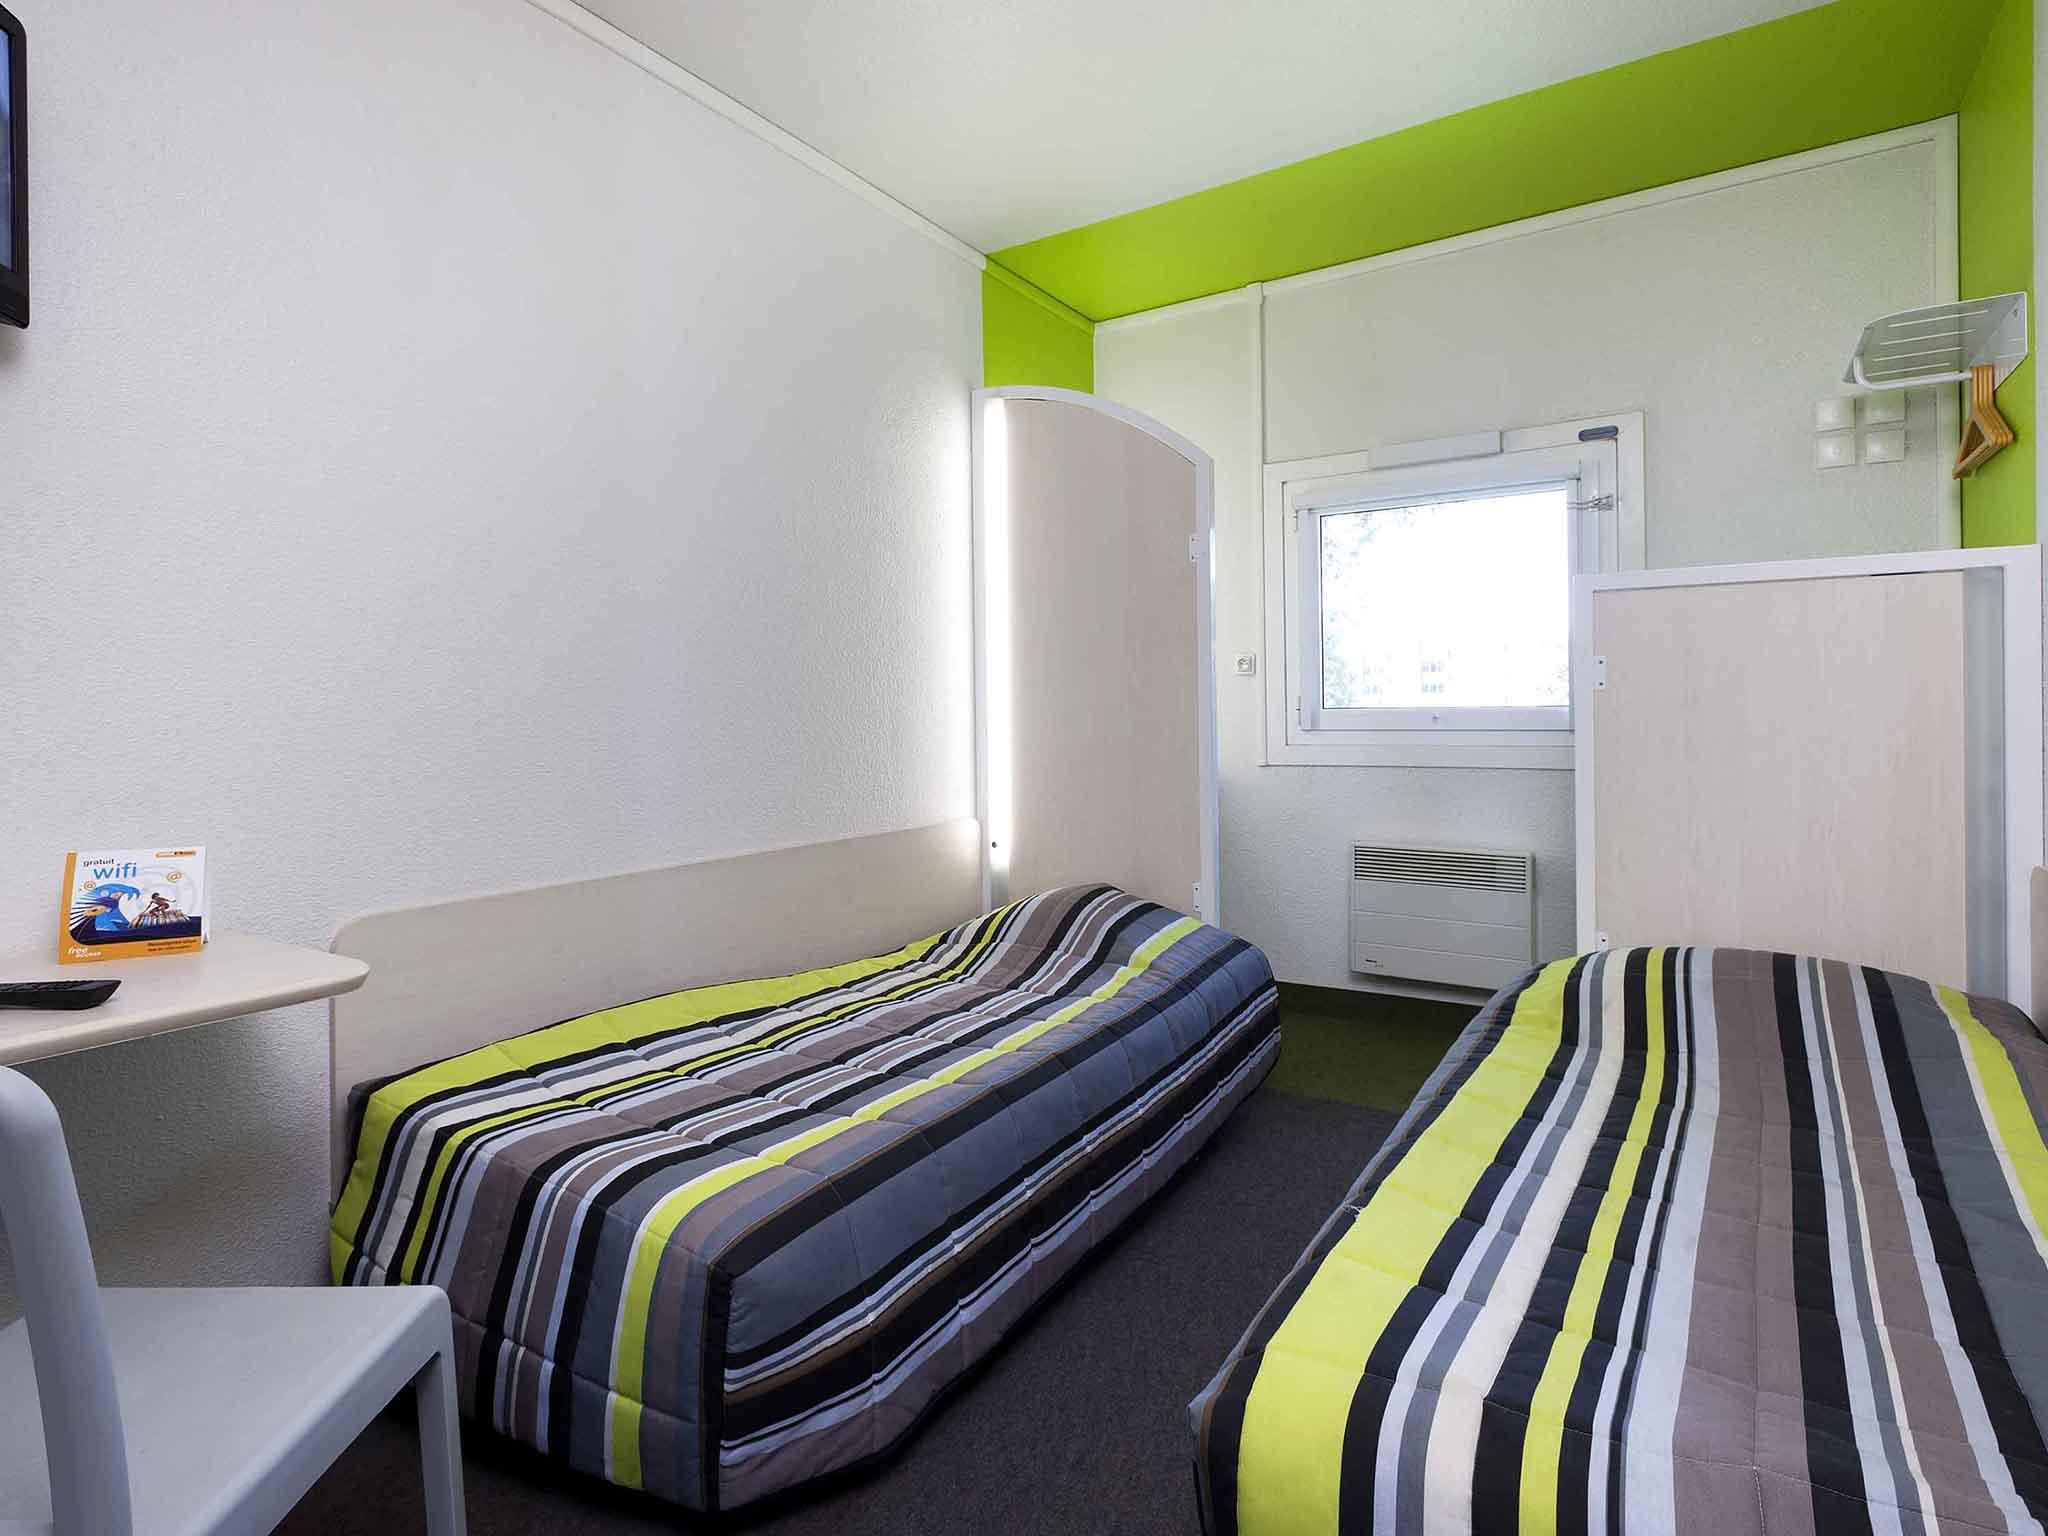 Hotel – hotelF1 Boulogne sur Mer